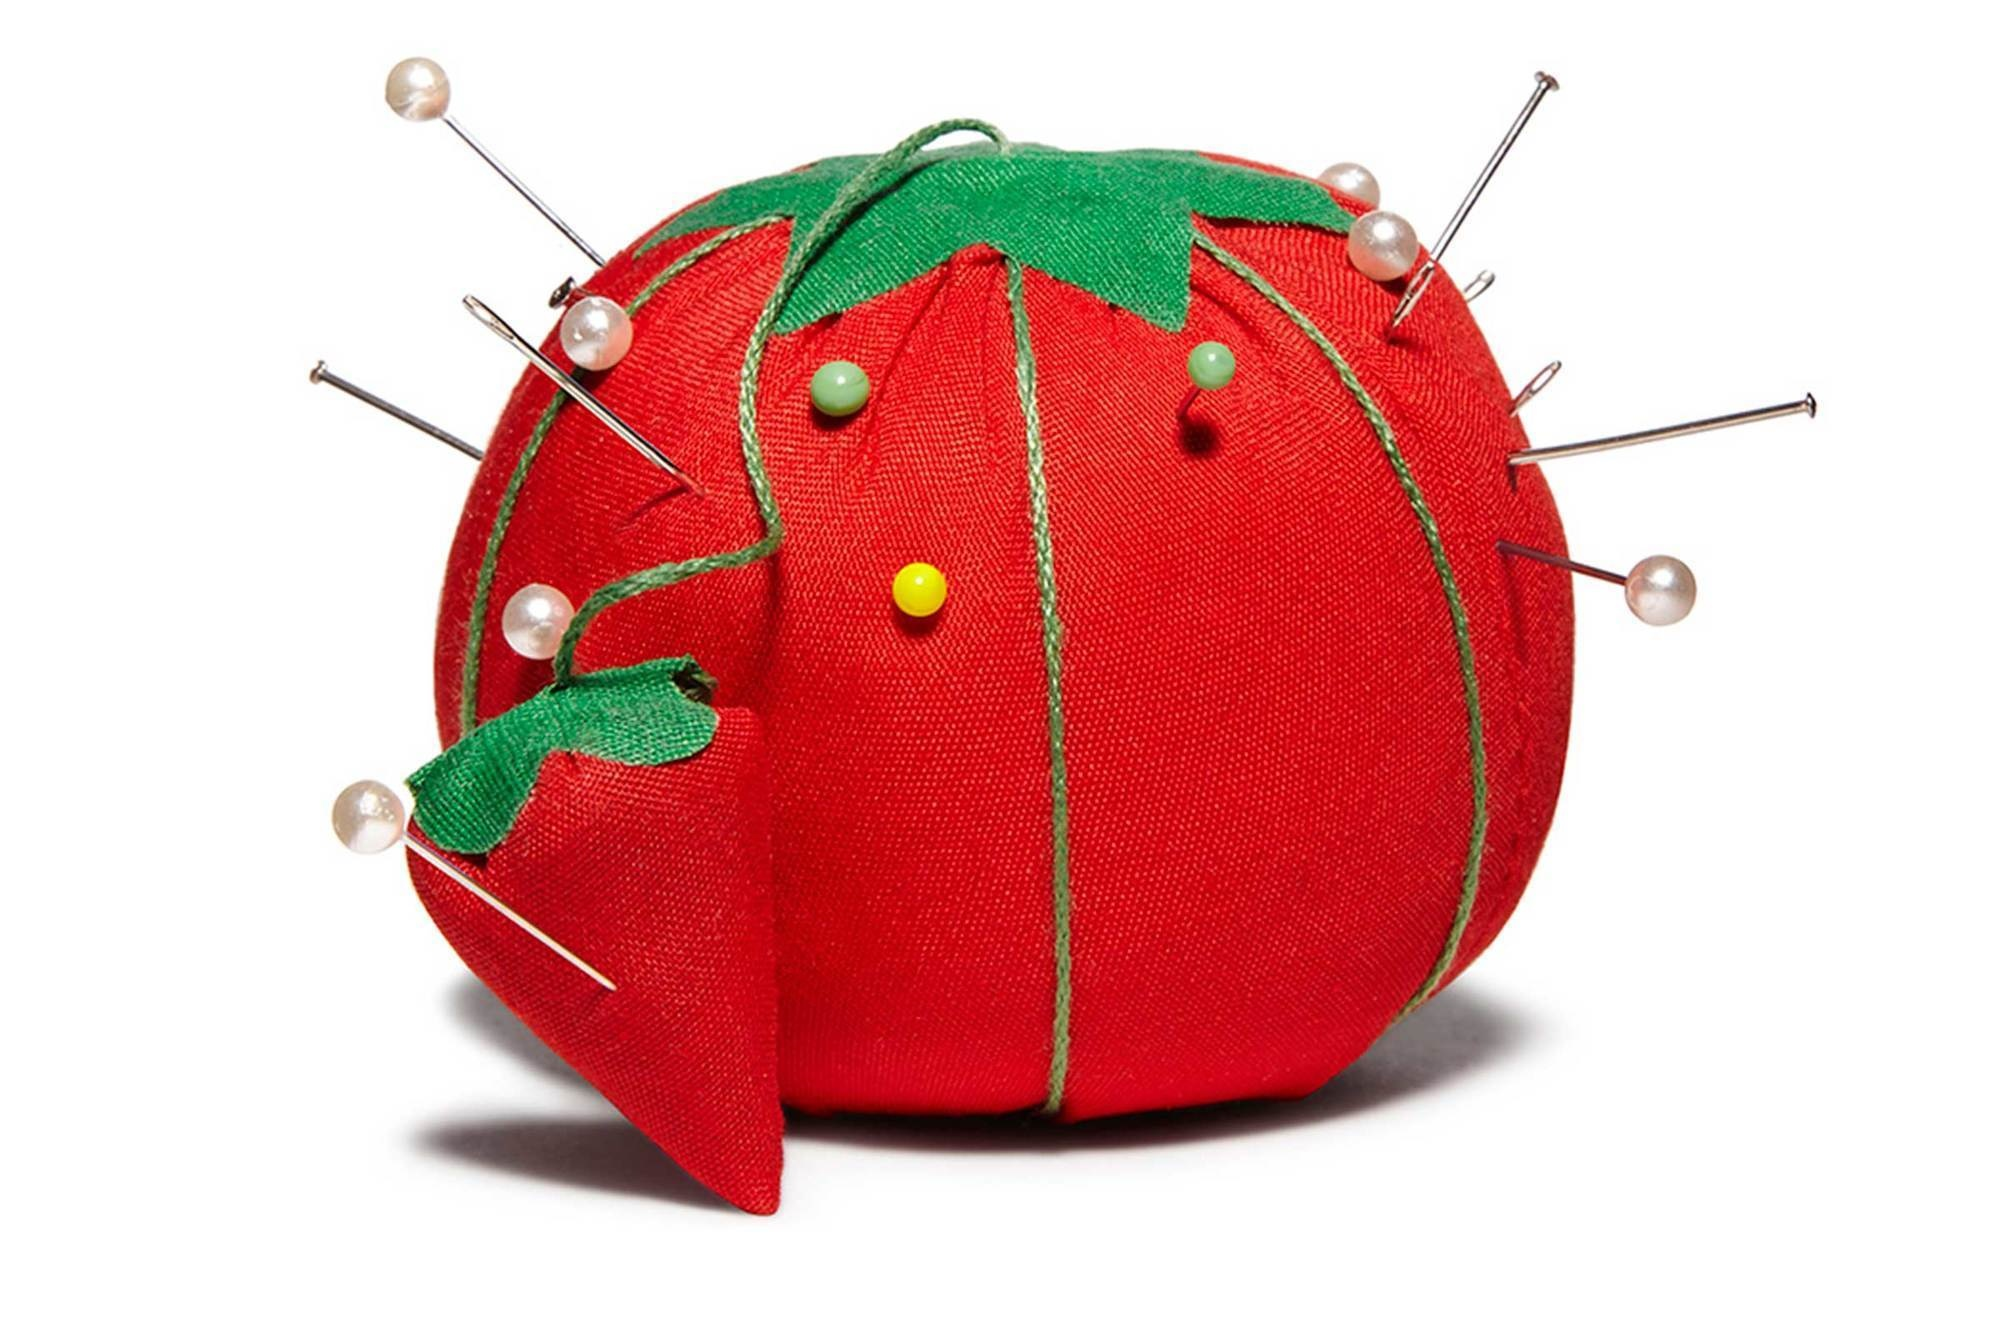 That Baby Strawberry Next To The Big Pincushion